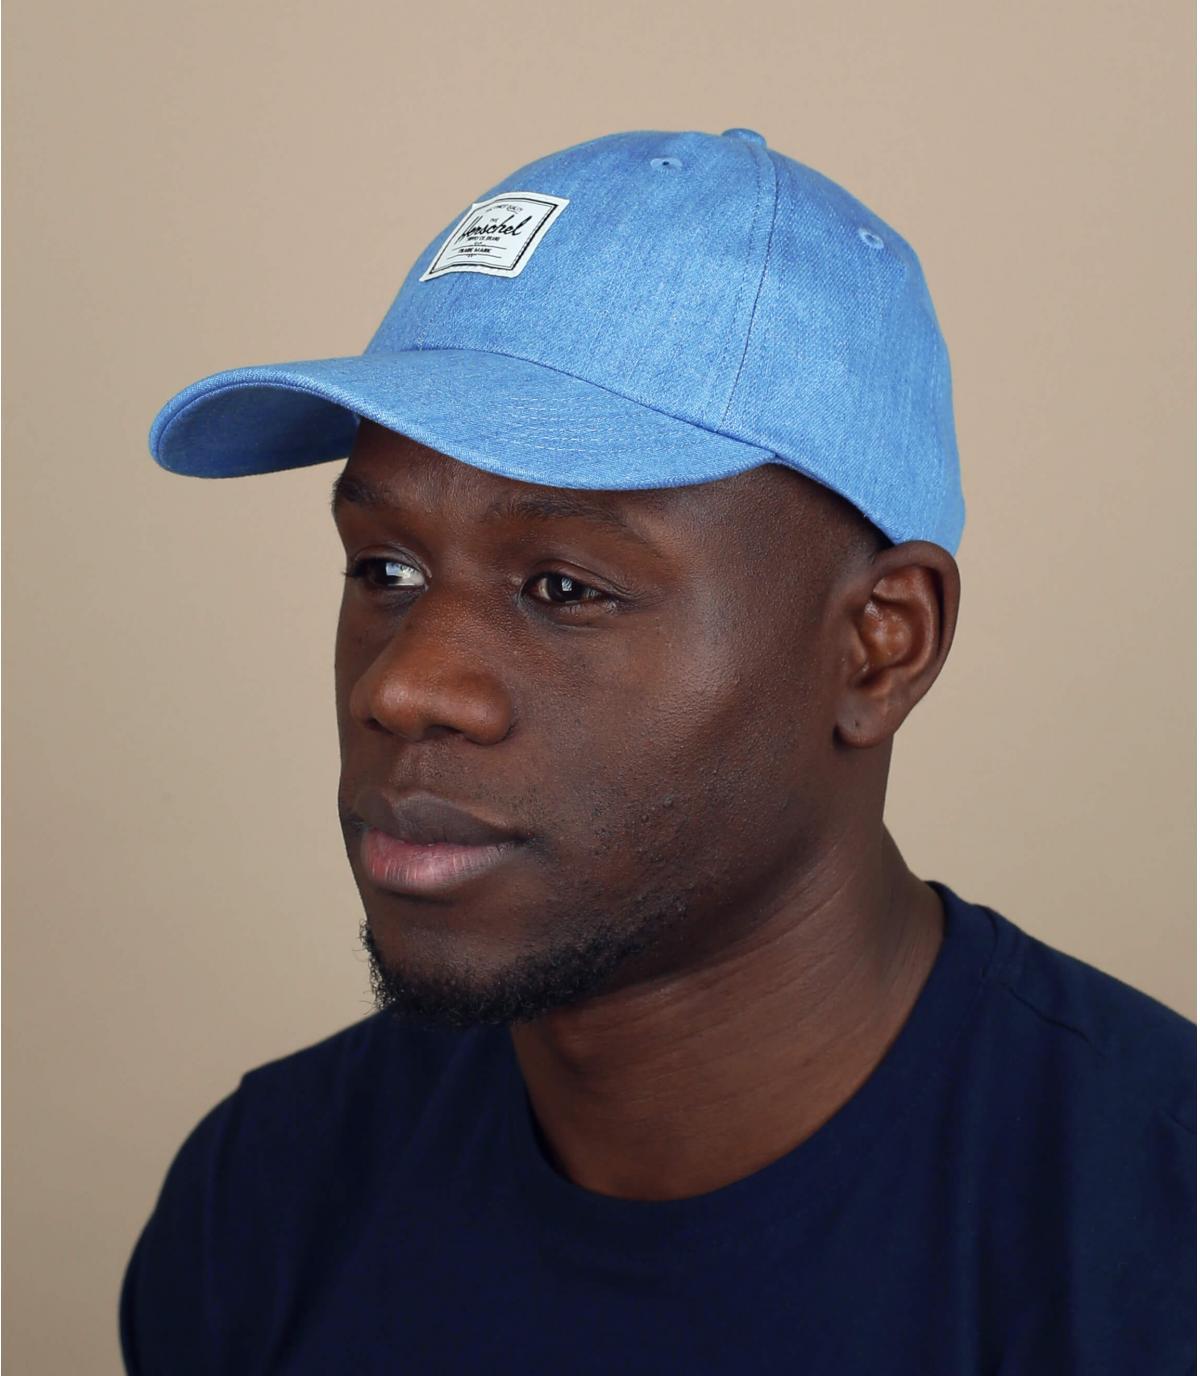 gorra Herschel azul claro